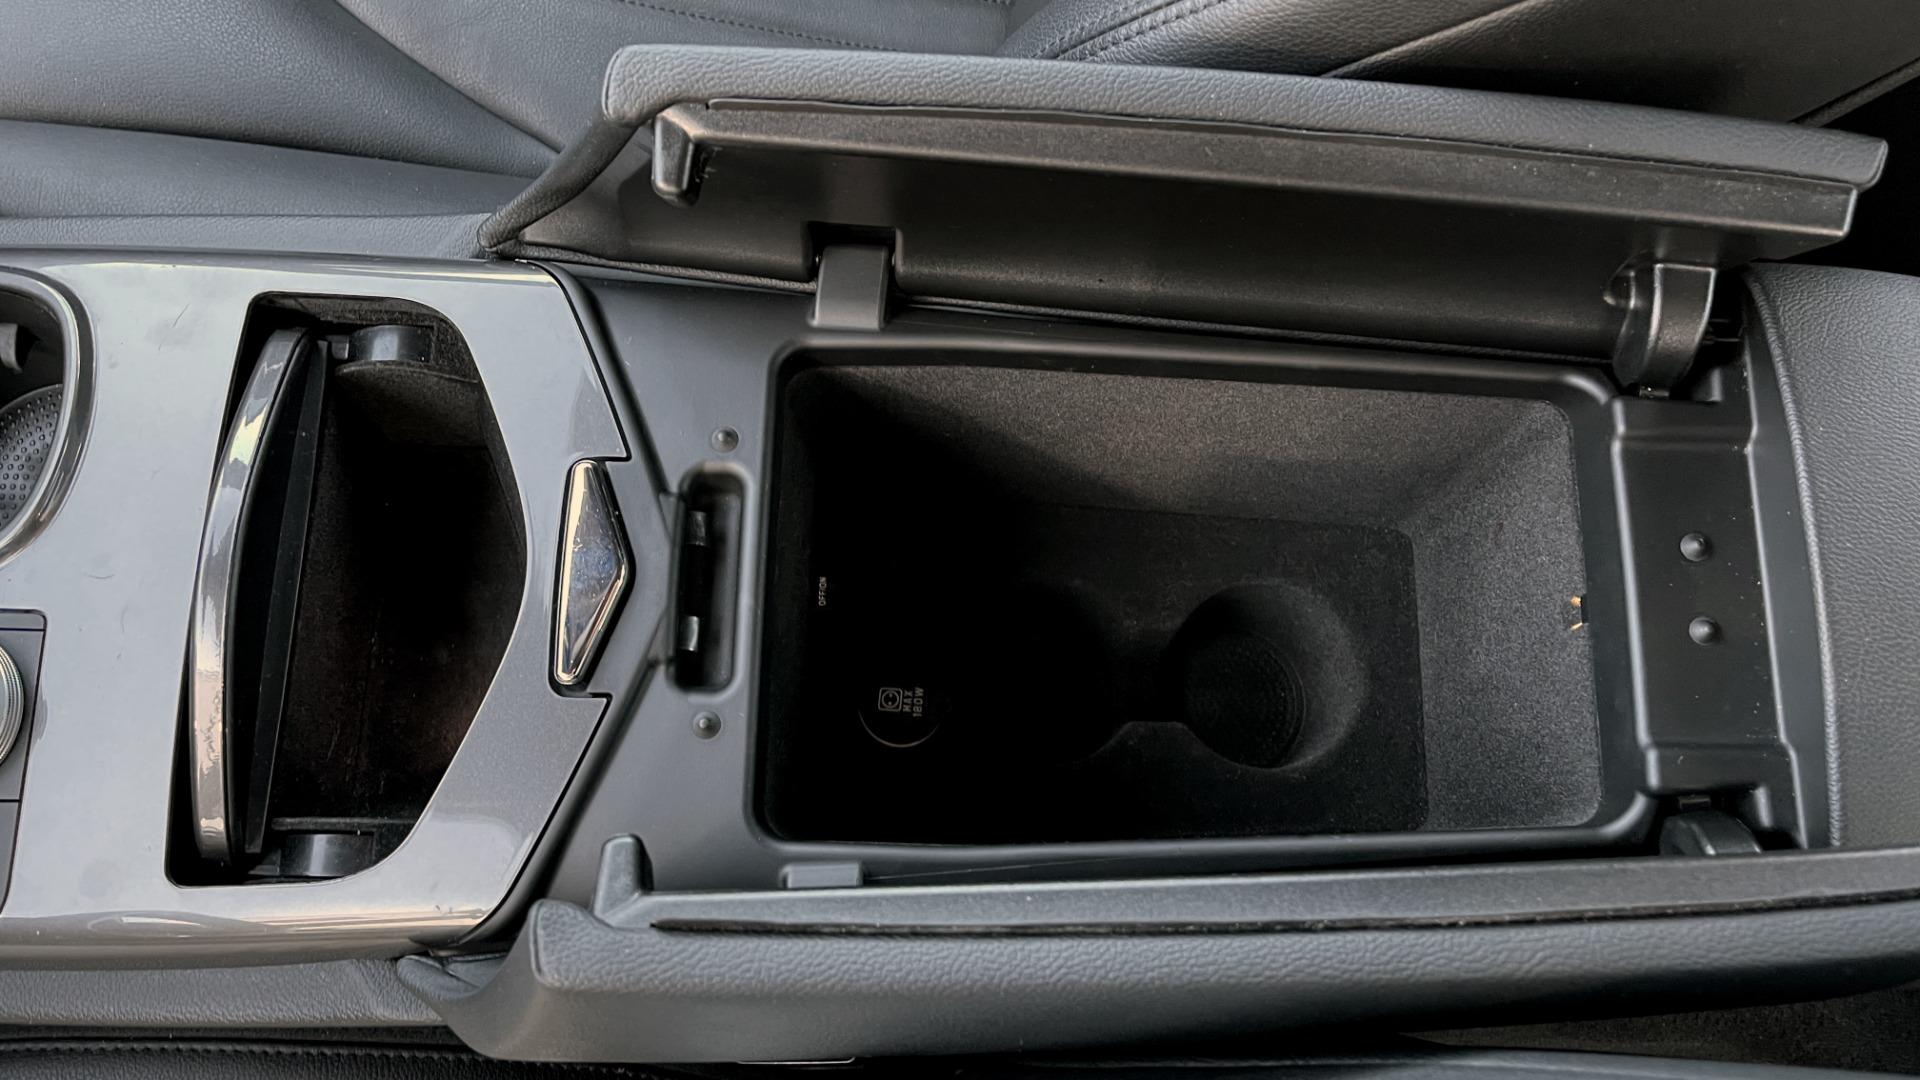 Used 2018 Maserati GHIBLI SEDAN / RWD / 3.0L V6 / SUNROOF / NAV / REARVIEW for sale $42,995 at Formula Imports in Charlotte NC 28227 45